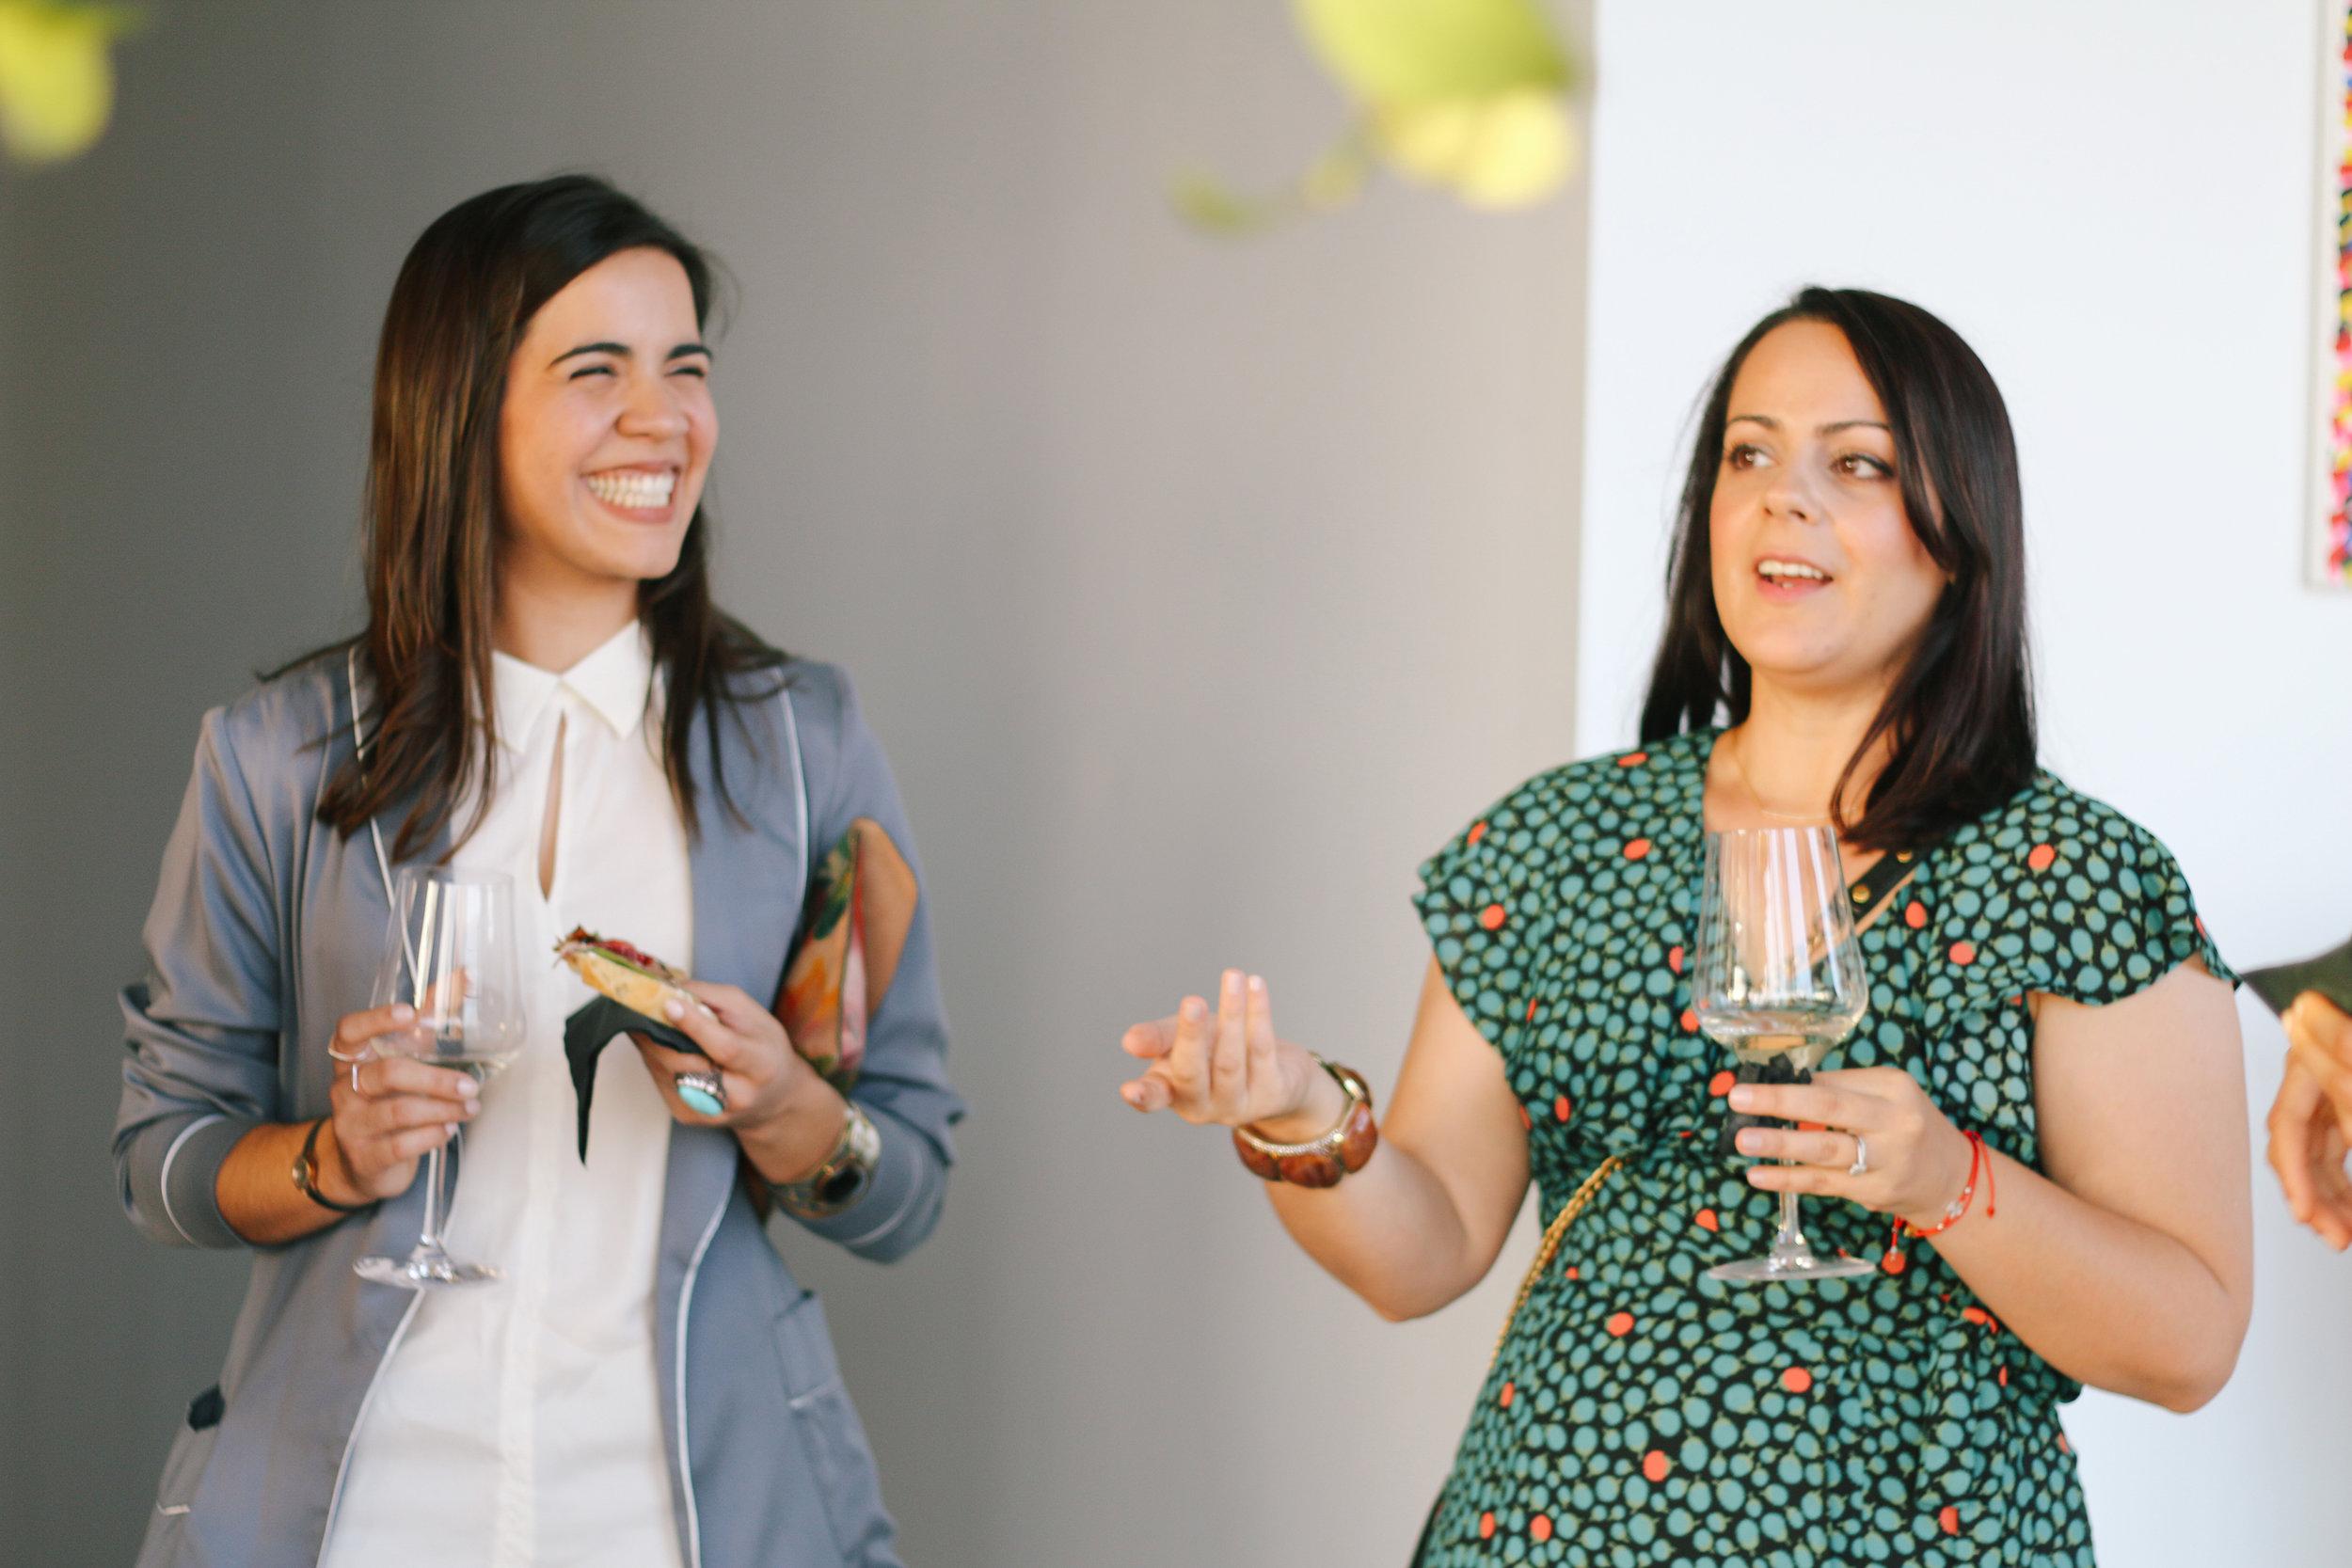 Women Who Wine Uncorked Conversations-Miami Wine Events-Wine Tasting Miami-29.jpg